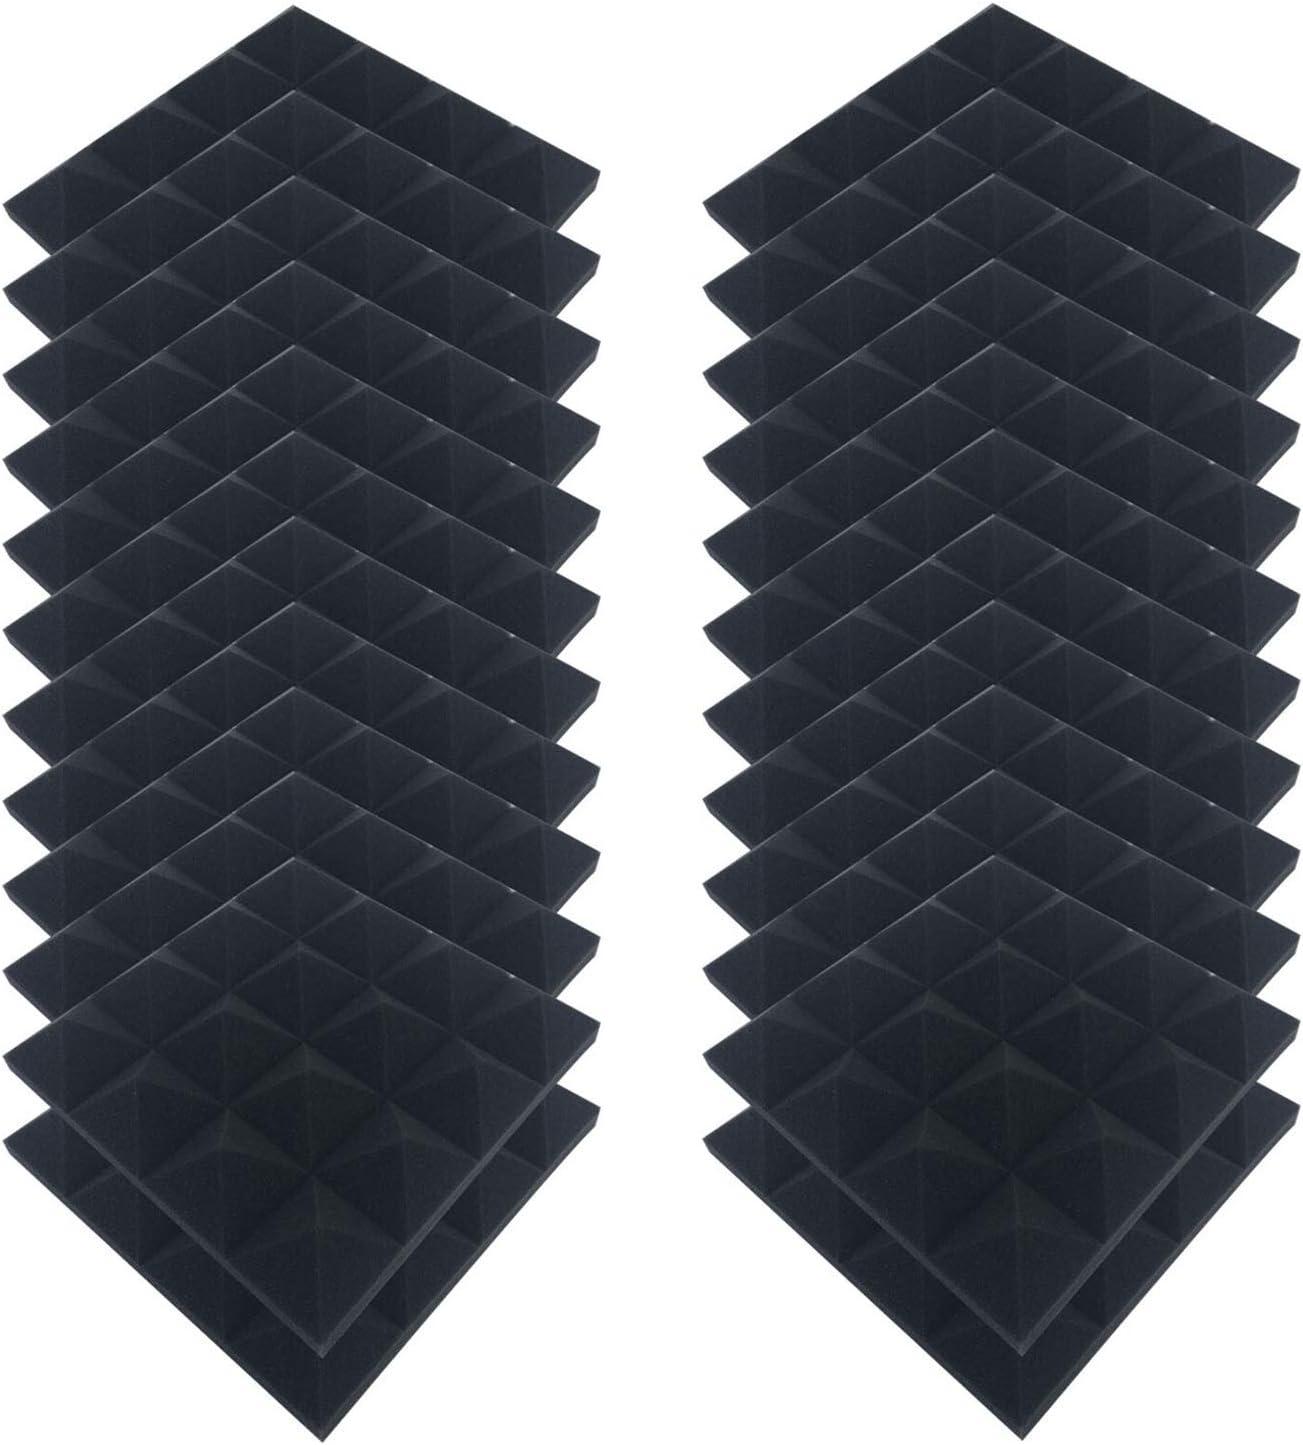 XUENING 24pcs Super sale period limited Acoustic Max 46% OFF Soundproofing Foam 25x25cm Egg Crate Stud